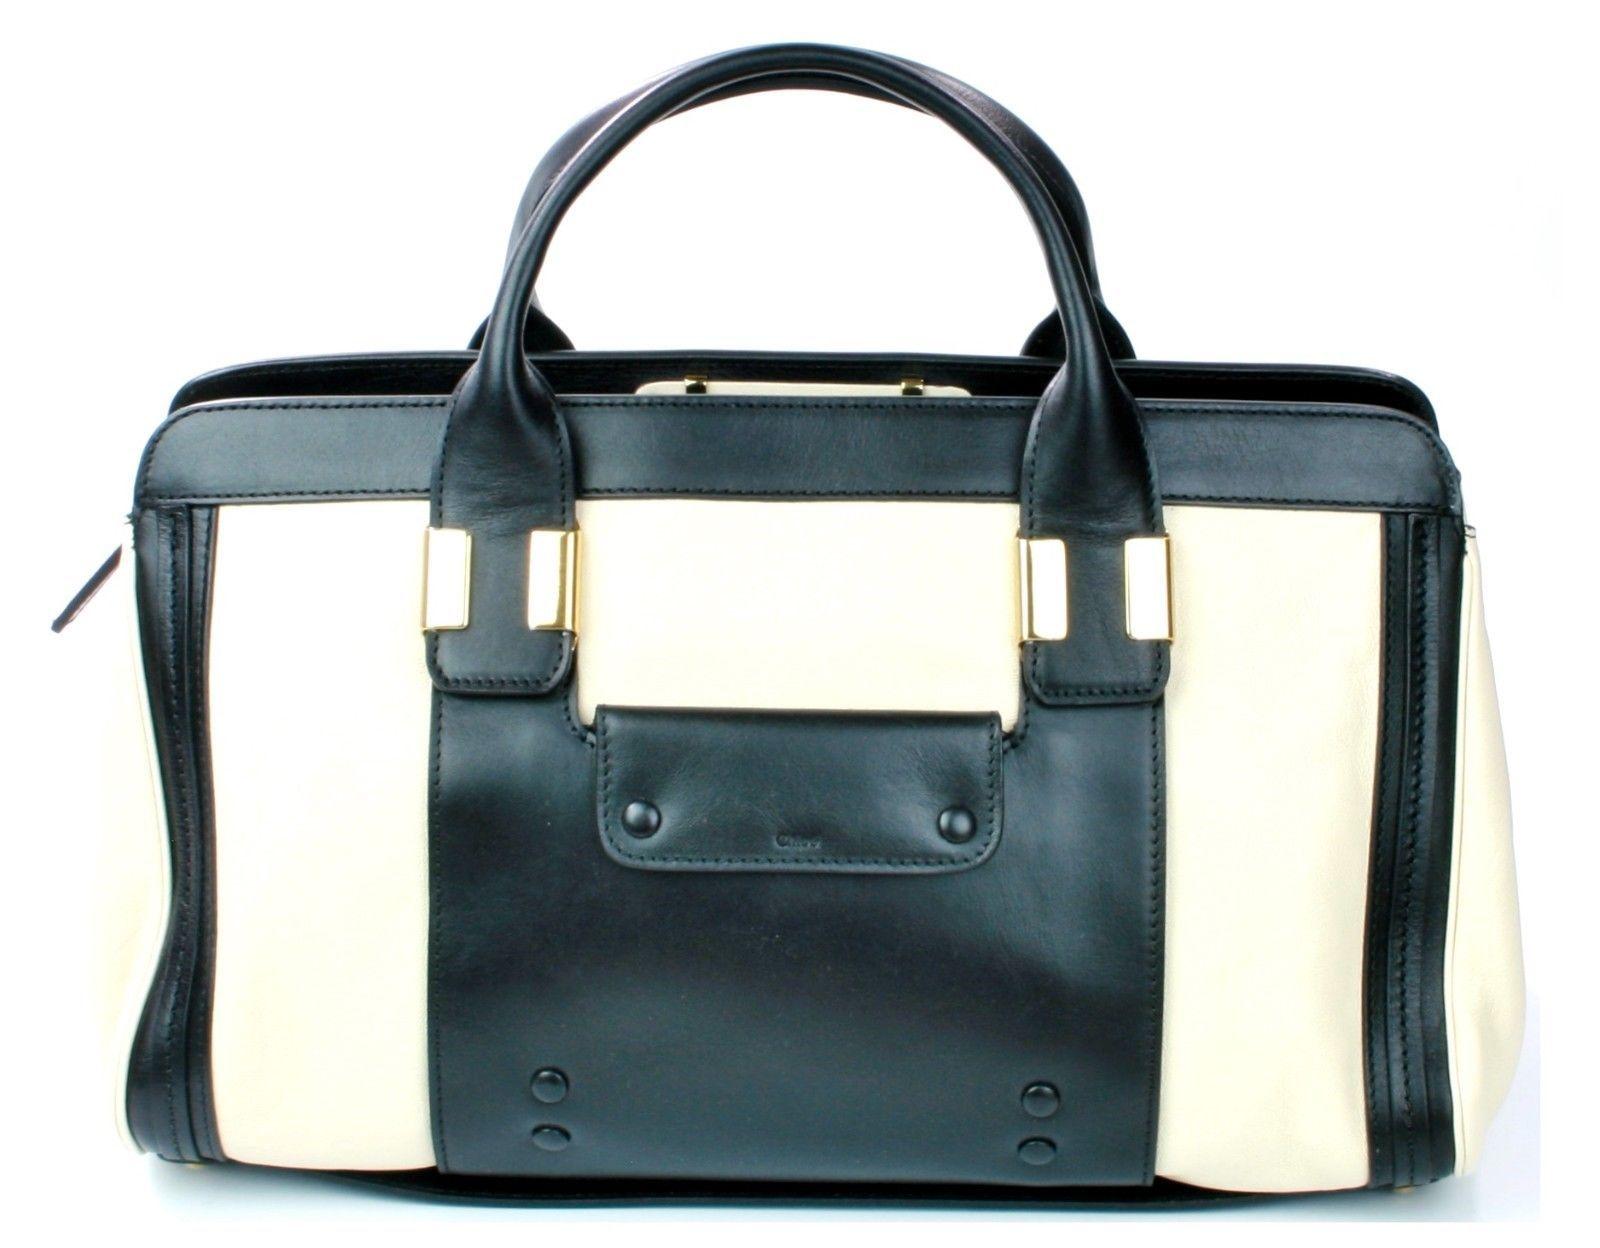 Chloe Alice Husky White Black Leather Tote Bag Medium Sized Handbag